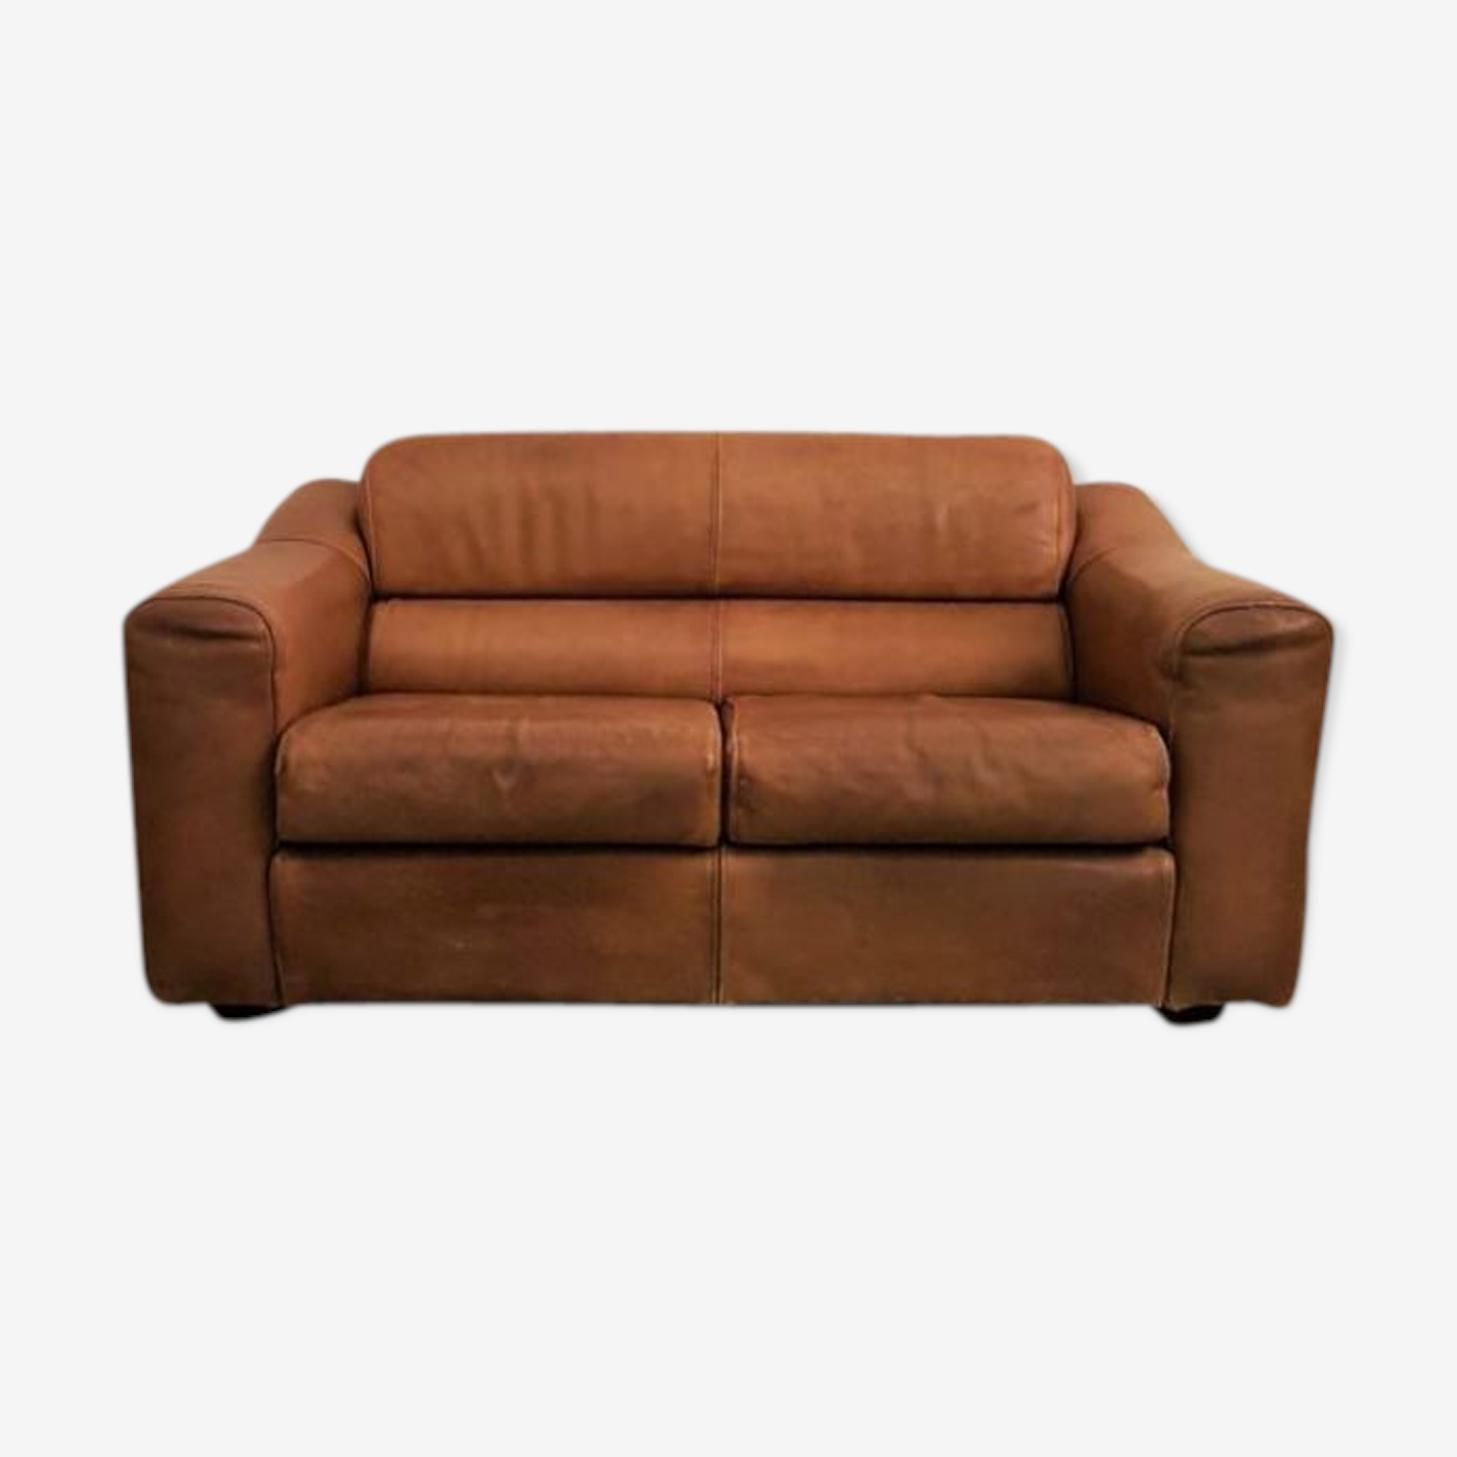 Canapé années 70 en cuir